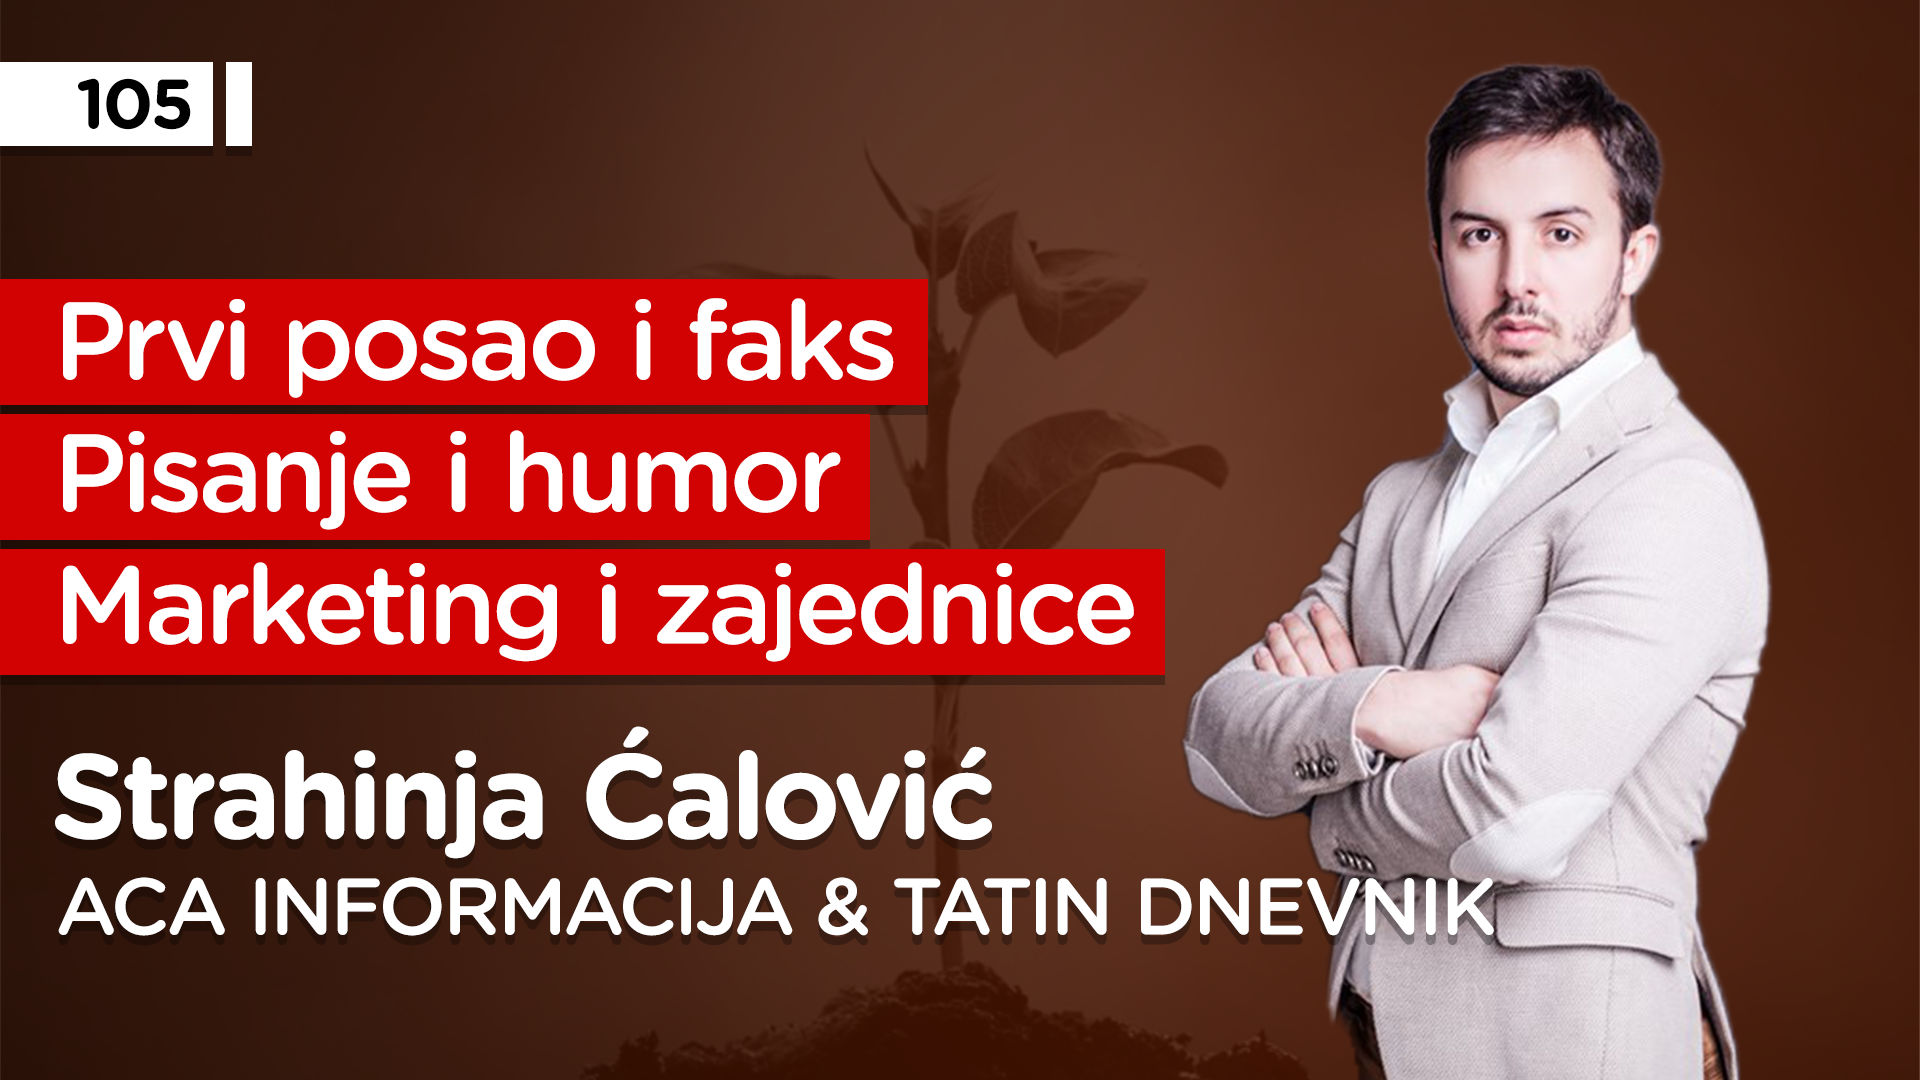 EP105: Strahinja Ćalović